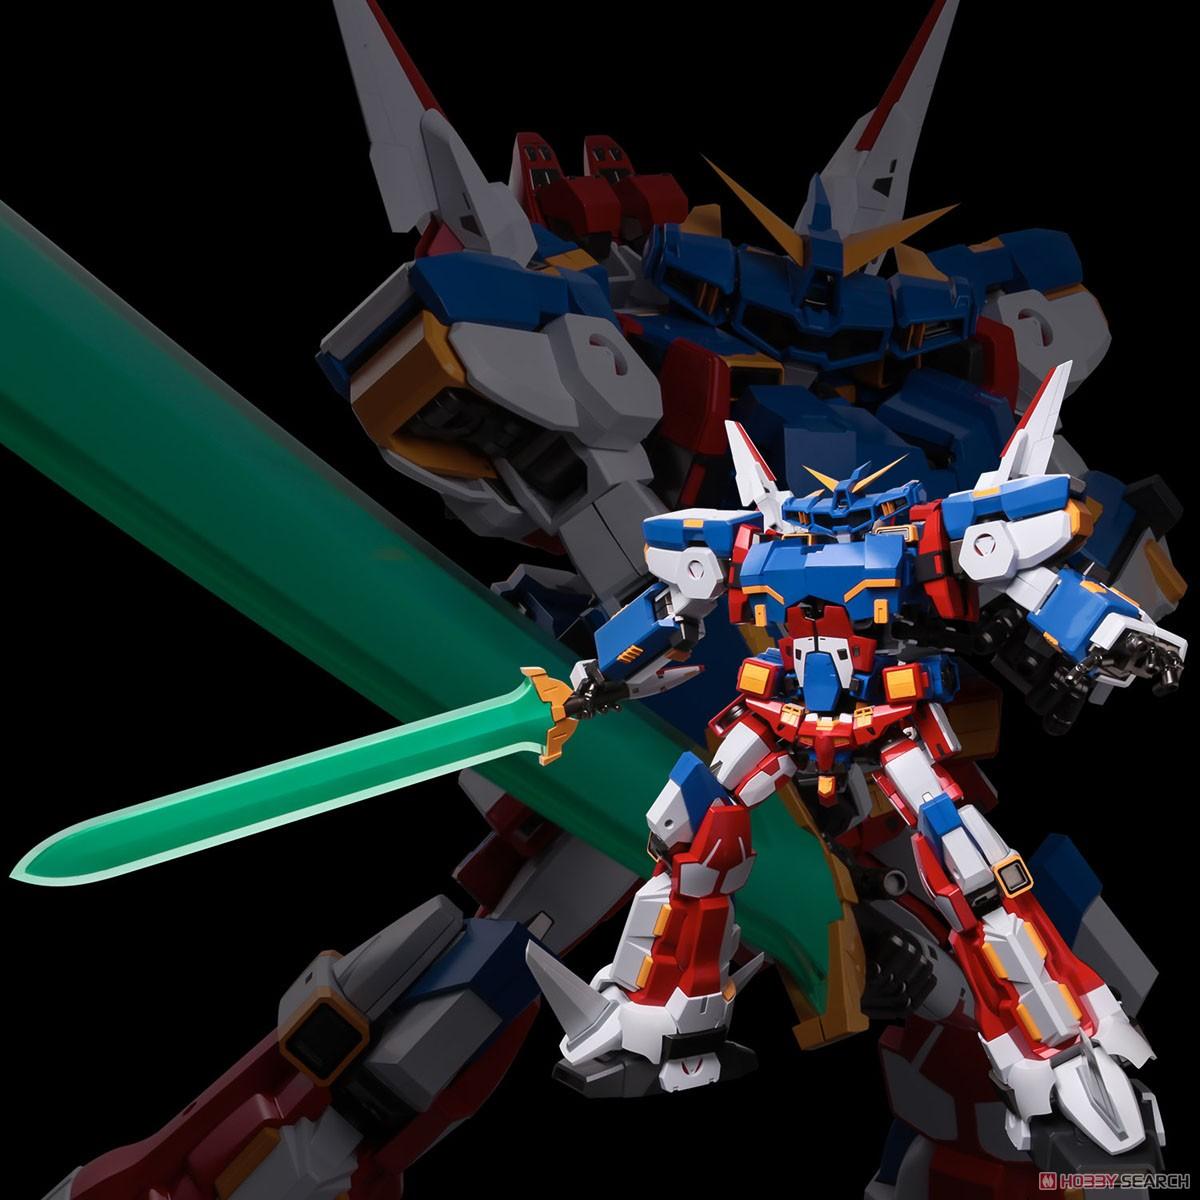 RIOBOT『変形合体 R-1』スーパーロボット大戦OG 可変合体フィギュア-049